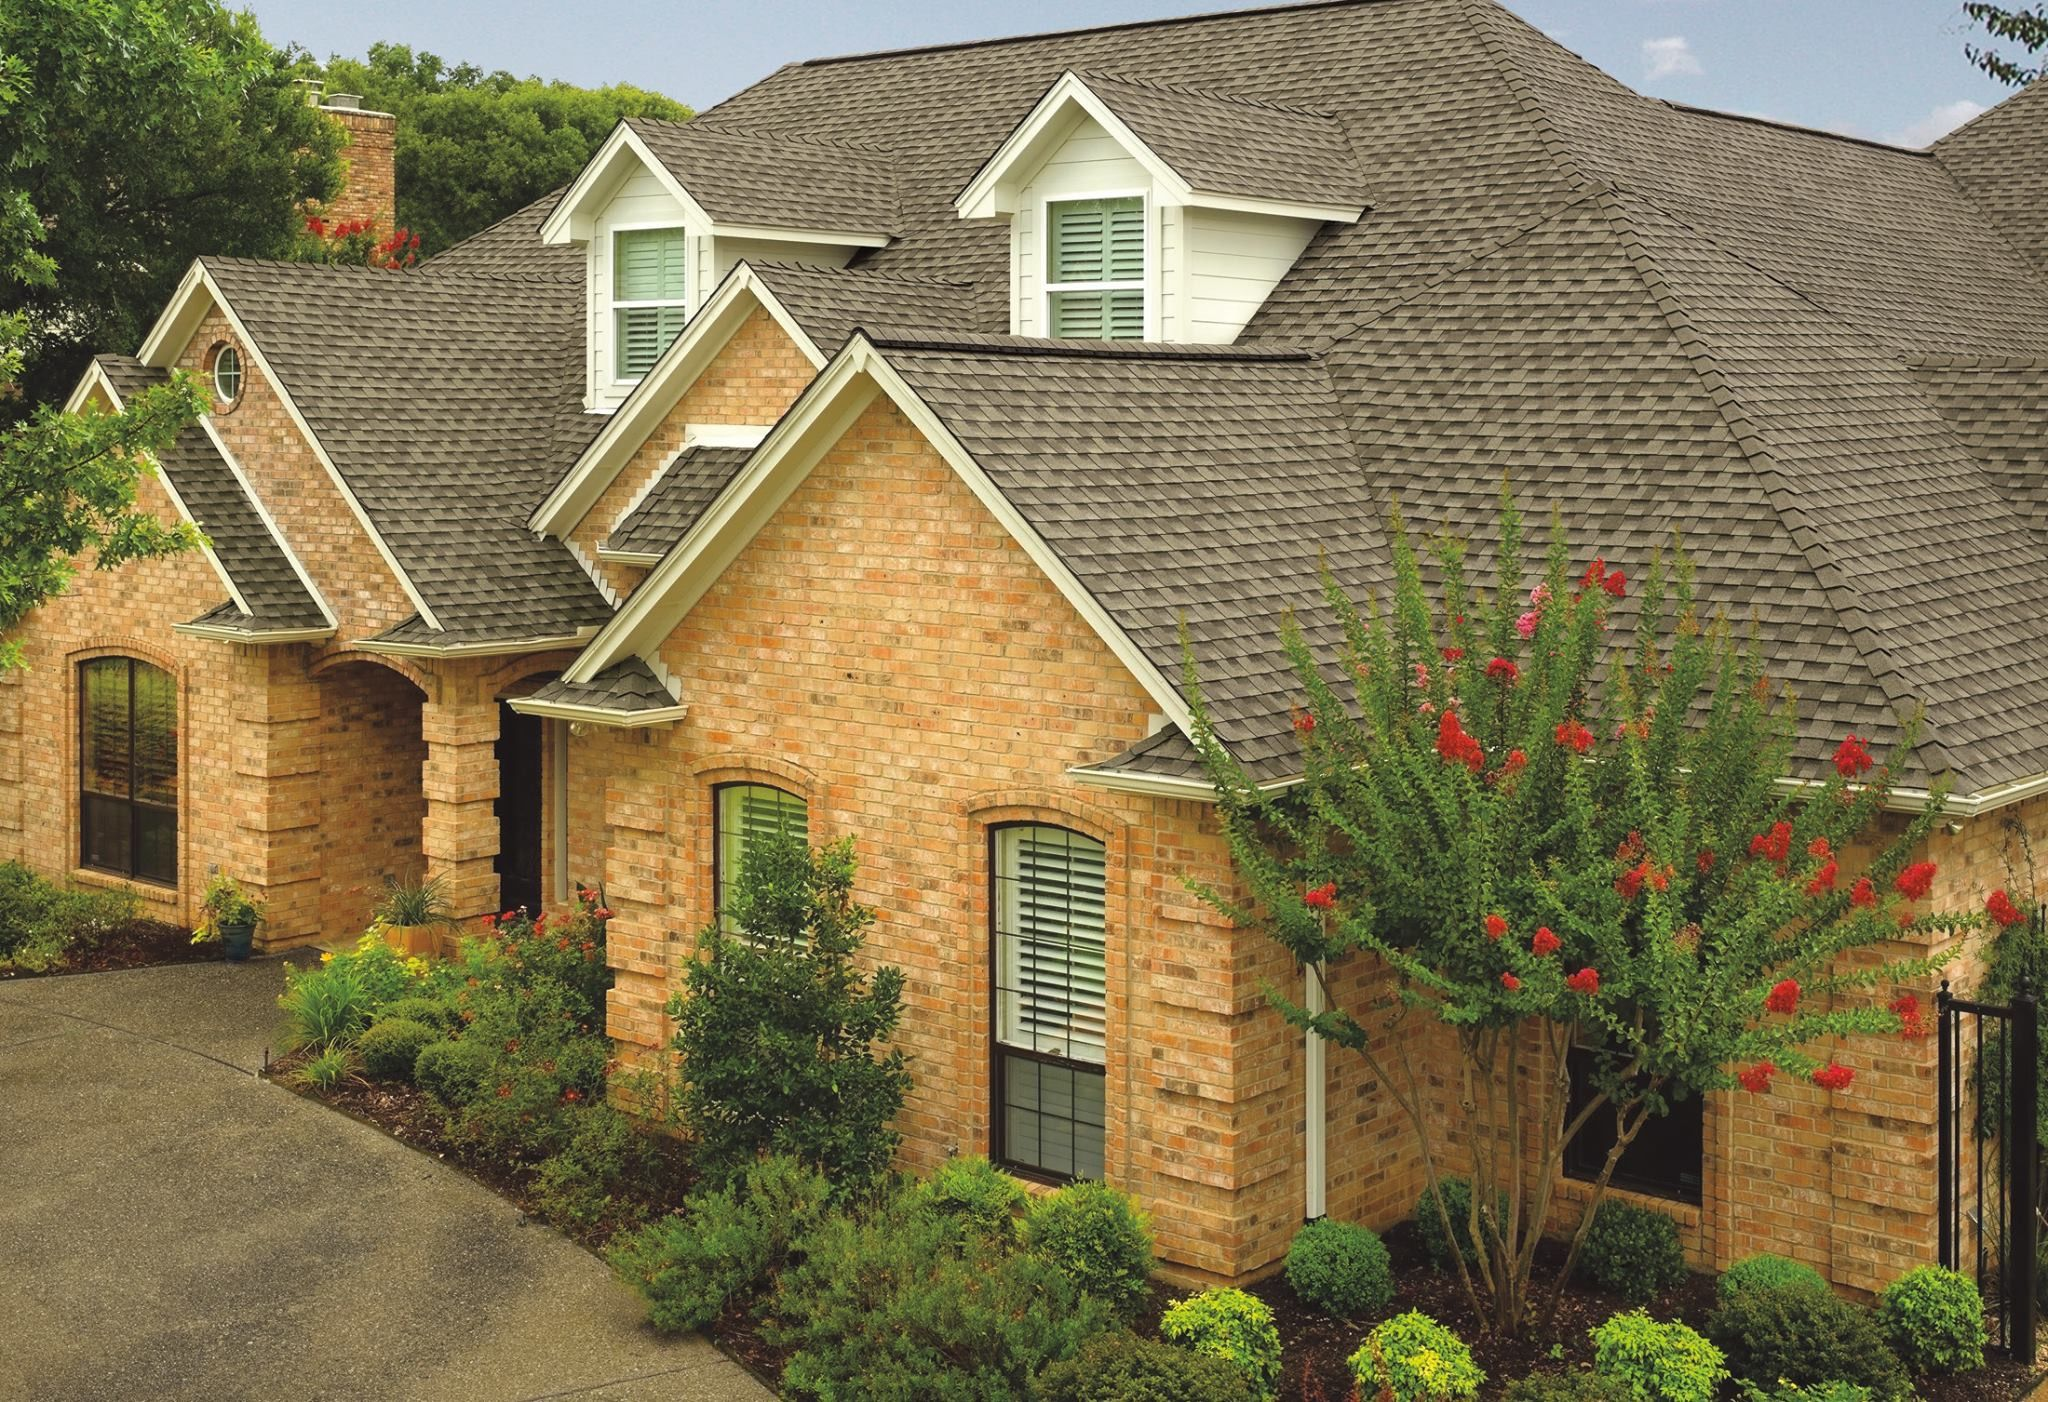 Okc Okcroof Bestofokc Bestroofokc Bestroof Oklahoma Roof Roofer Newroof Slate Roof Shingles Roof Shingles Roofing